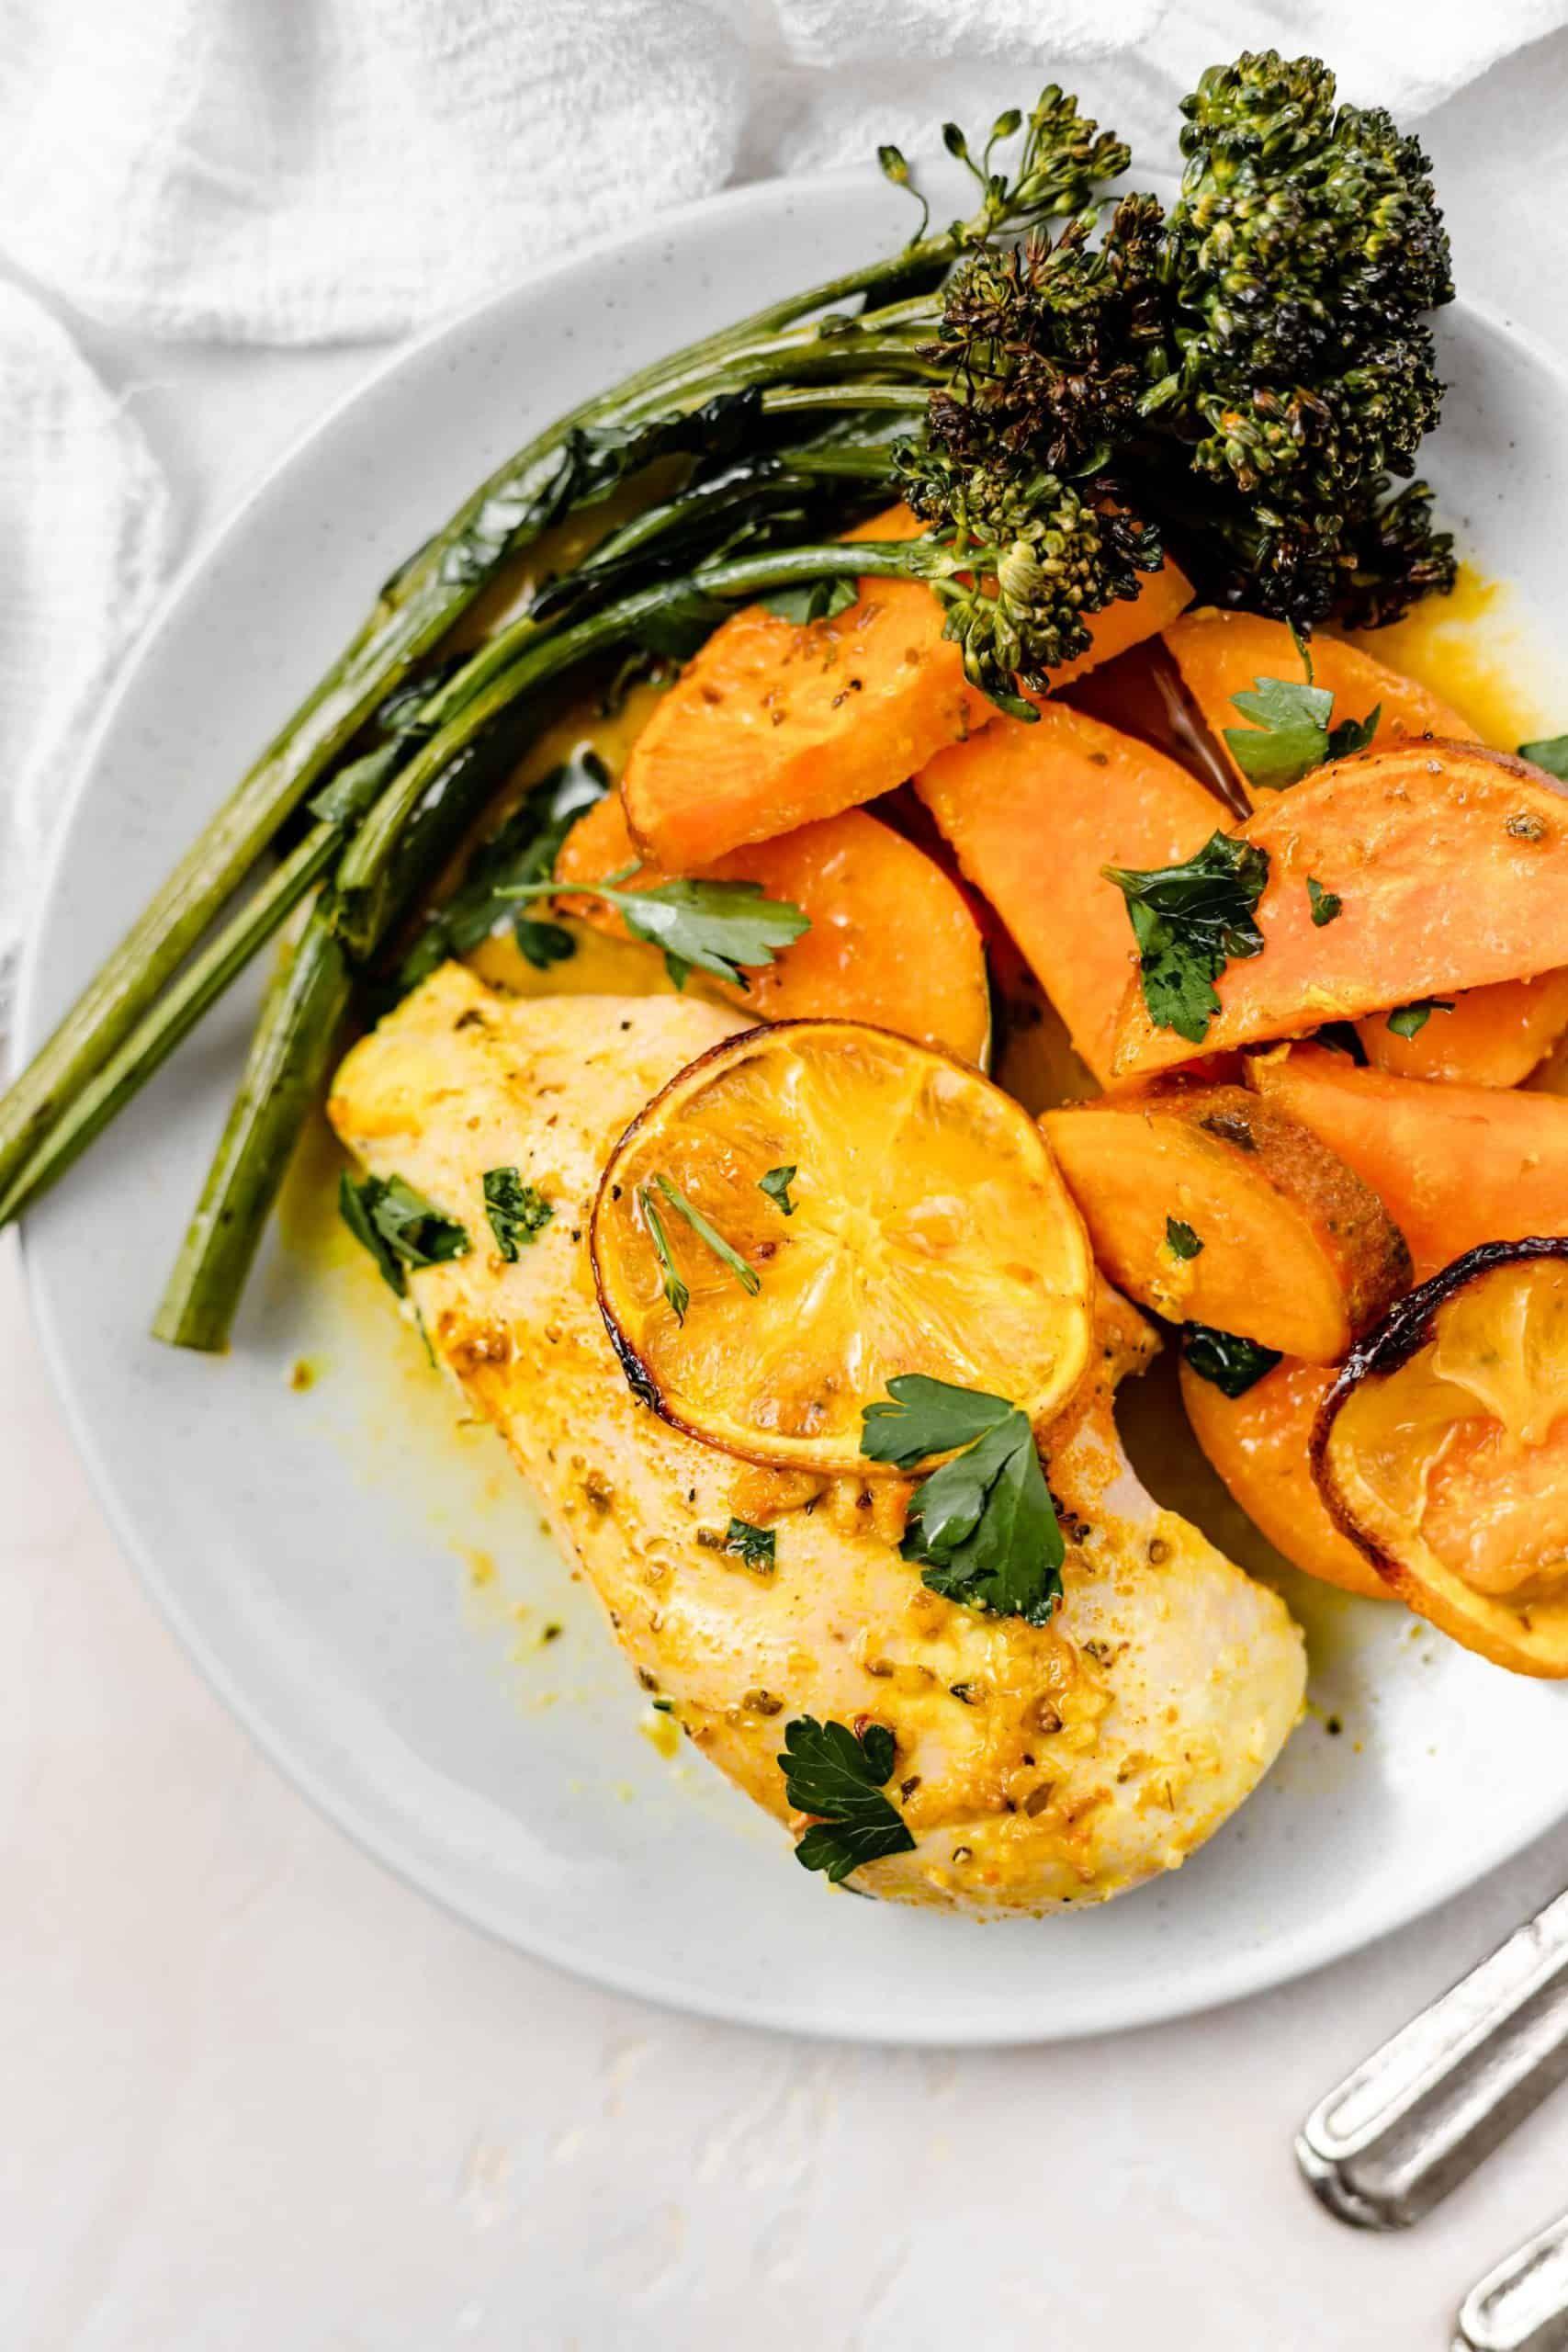 Healthy Lemon Chicken And Sweet Potatoes Recipe In 2020 Healthy Lemon Chicken Healthy Lemon Chicken Recipe Paleo Sweet Potato